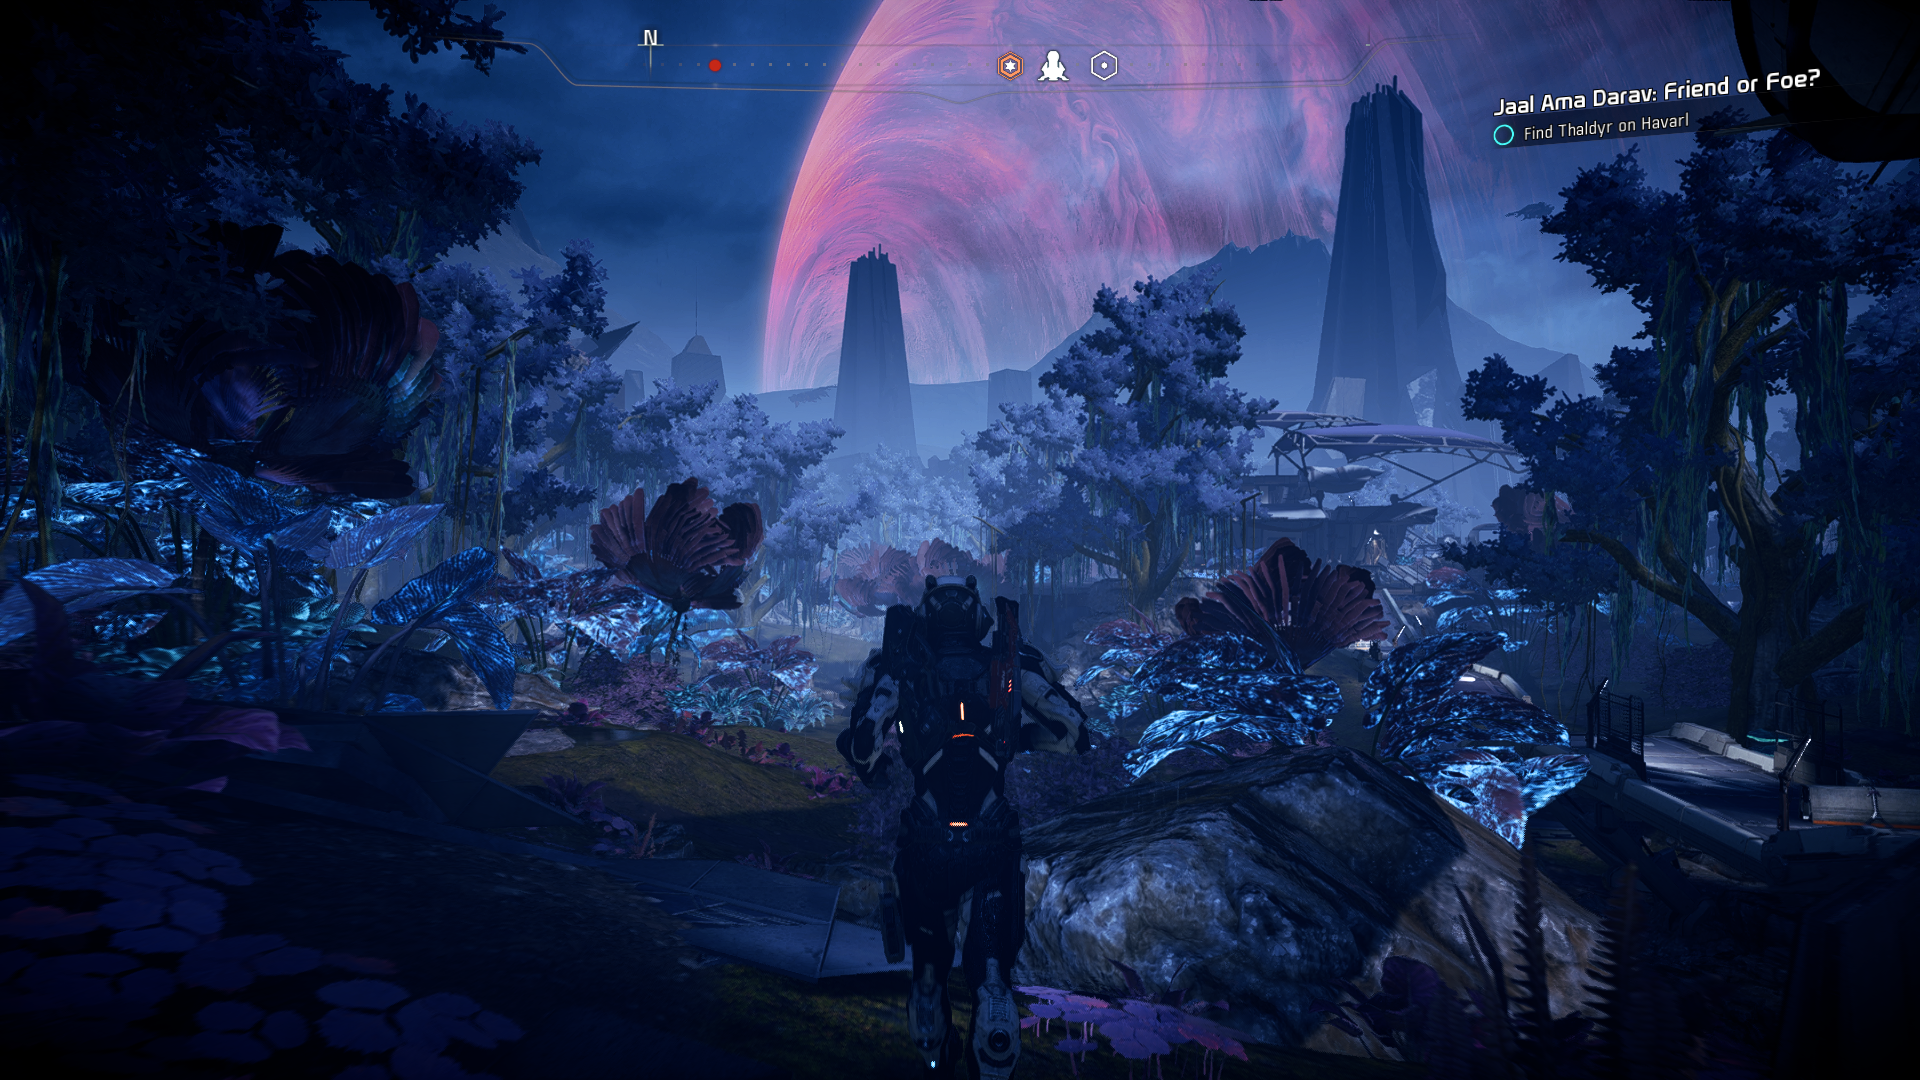 Mass Effect Andromeda - nový začátek v nové galaxii 141100